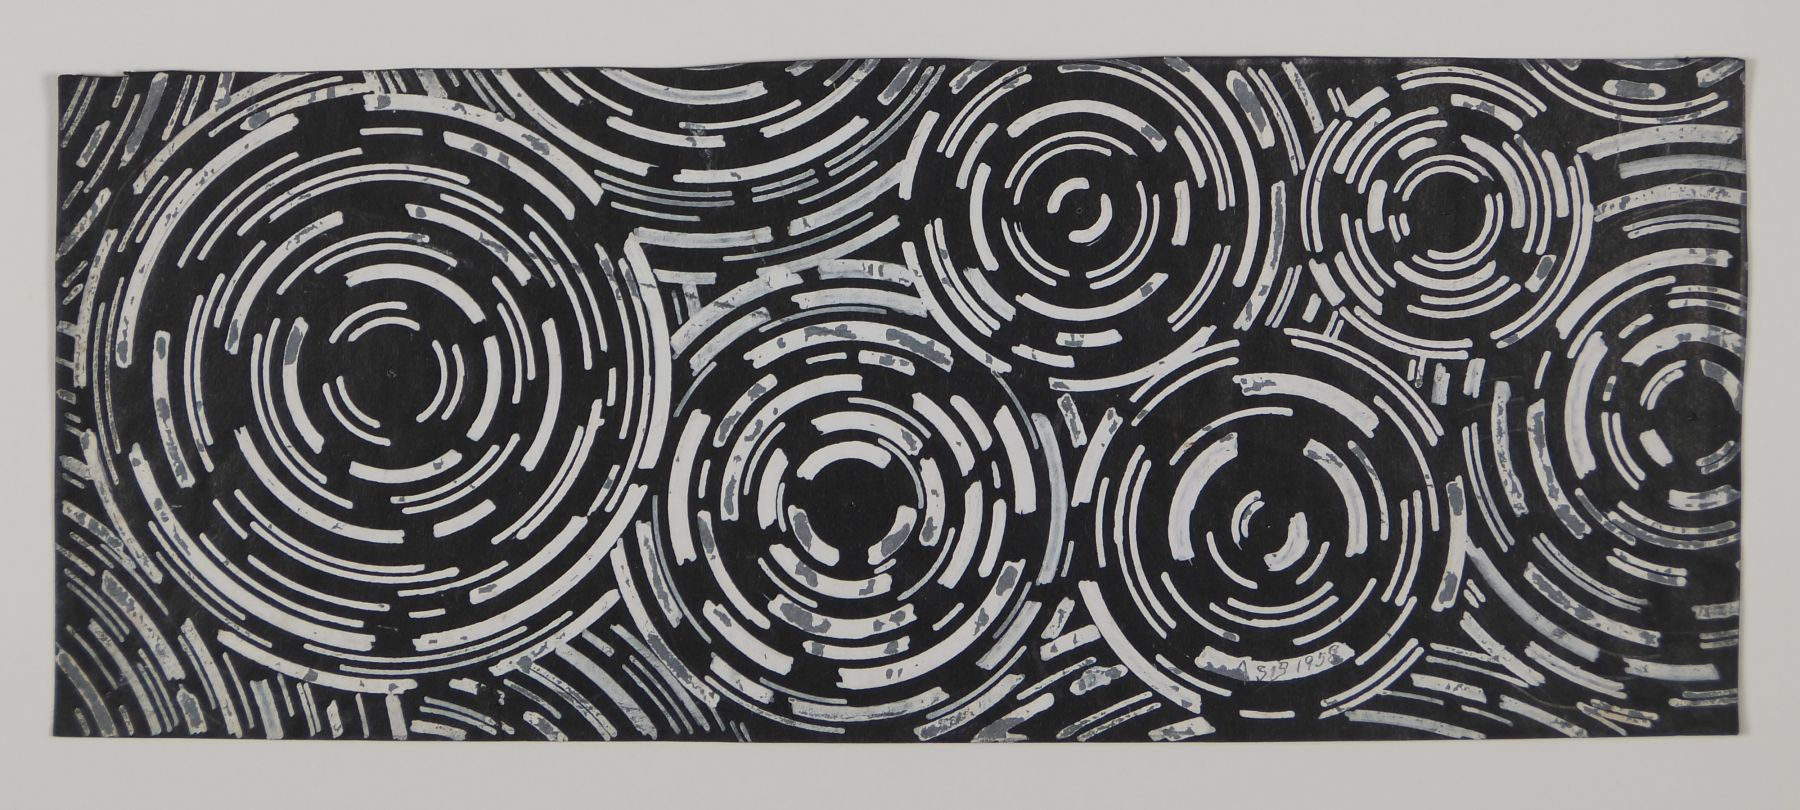 Antonio Asis,Esquisse noire, 1958,Gouache and ink on paper,3 9/16 x 8 7/8 in. (9.2 x 22.6 cm.)